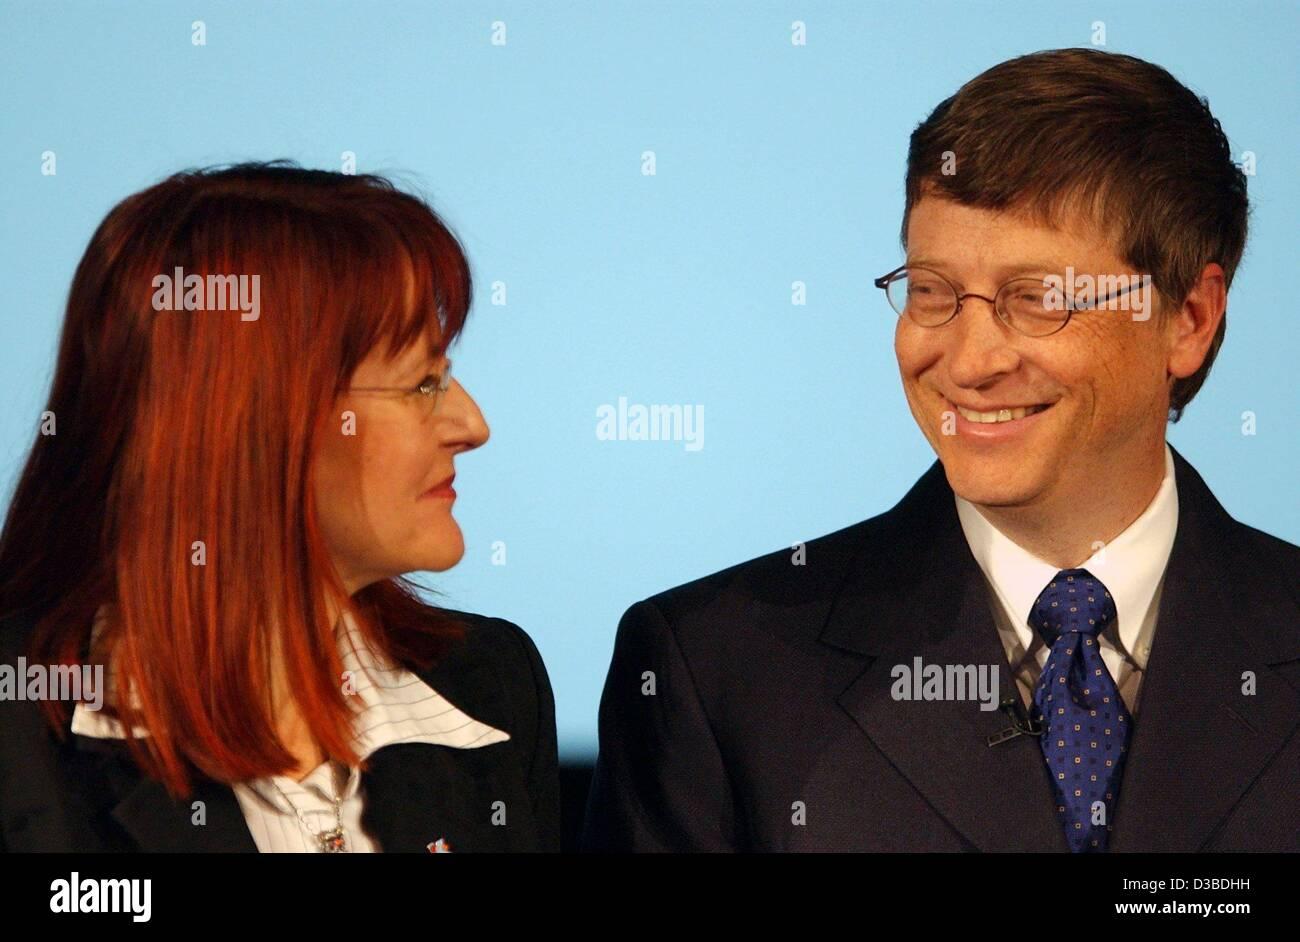 dpa) - Microsoft founder Bill Gates stands next to German